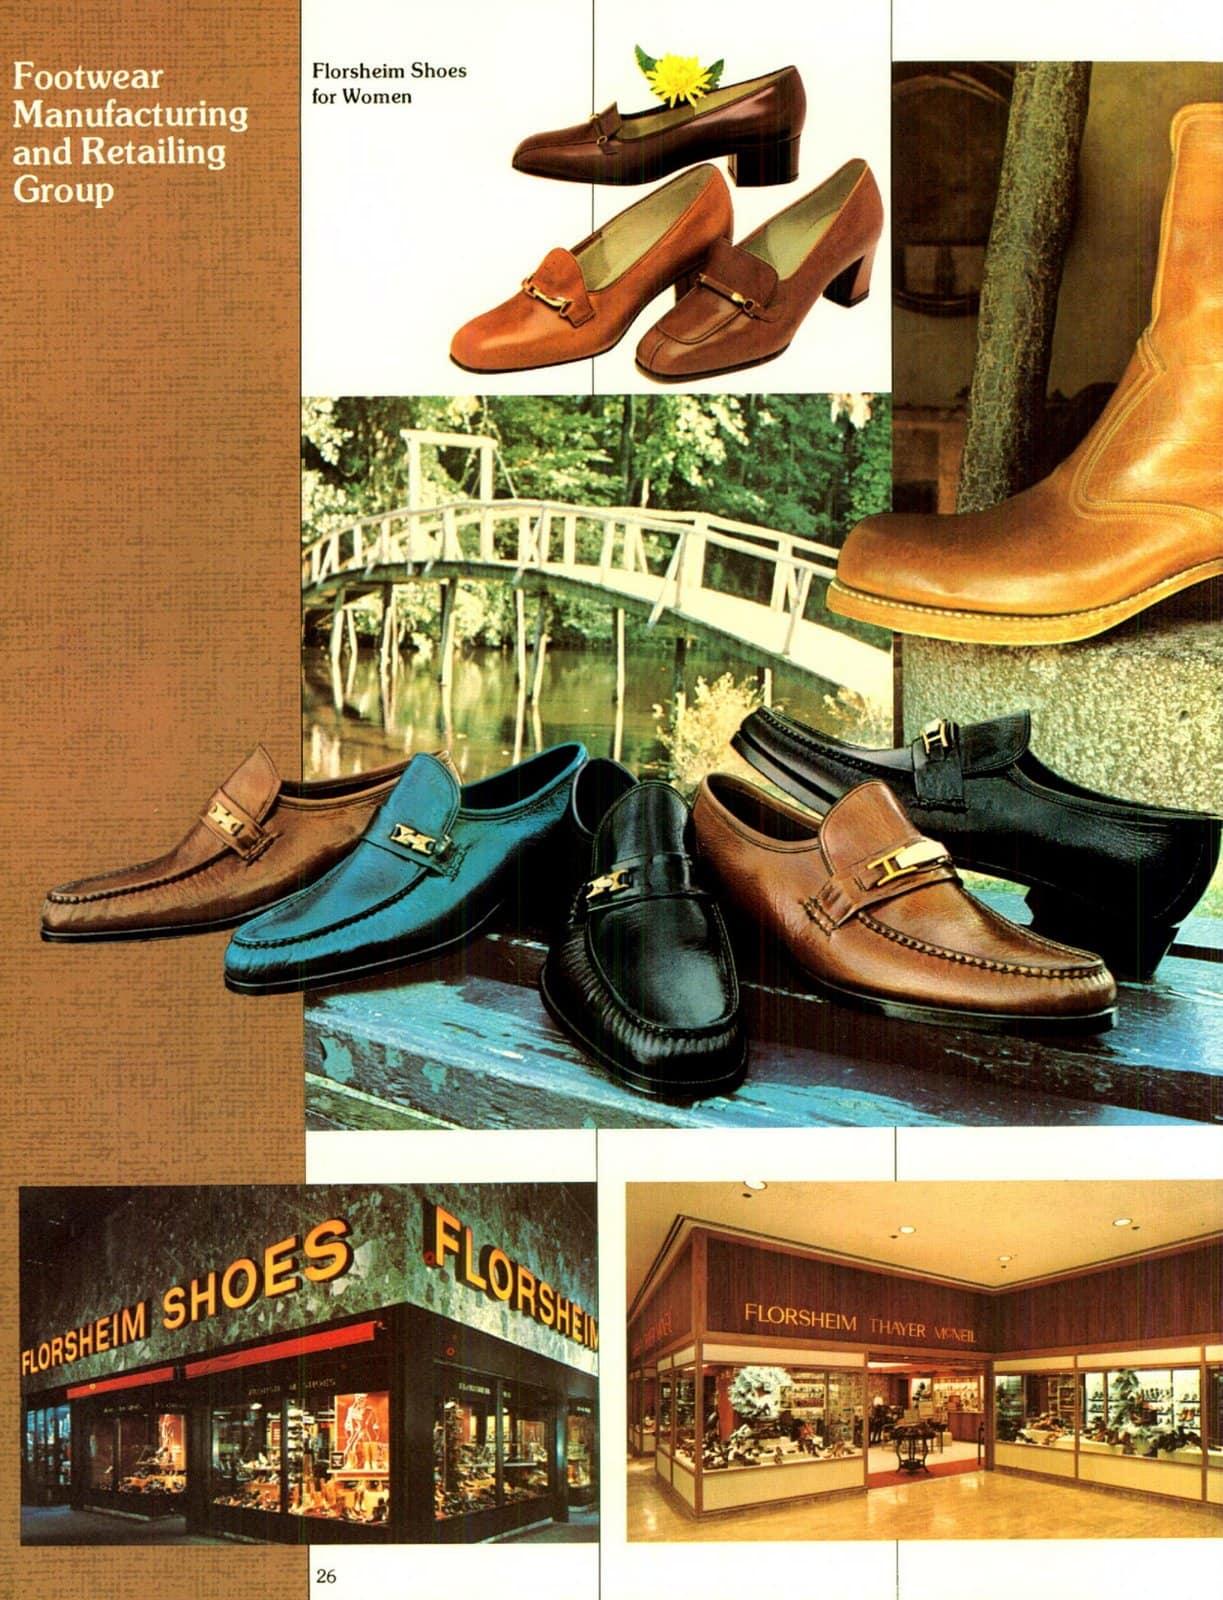 Florsheim shoe stores in 1976